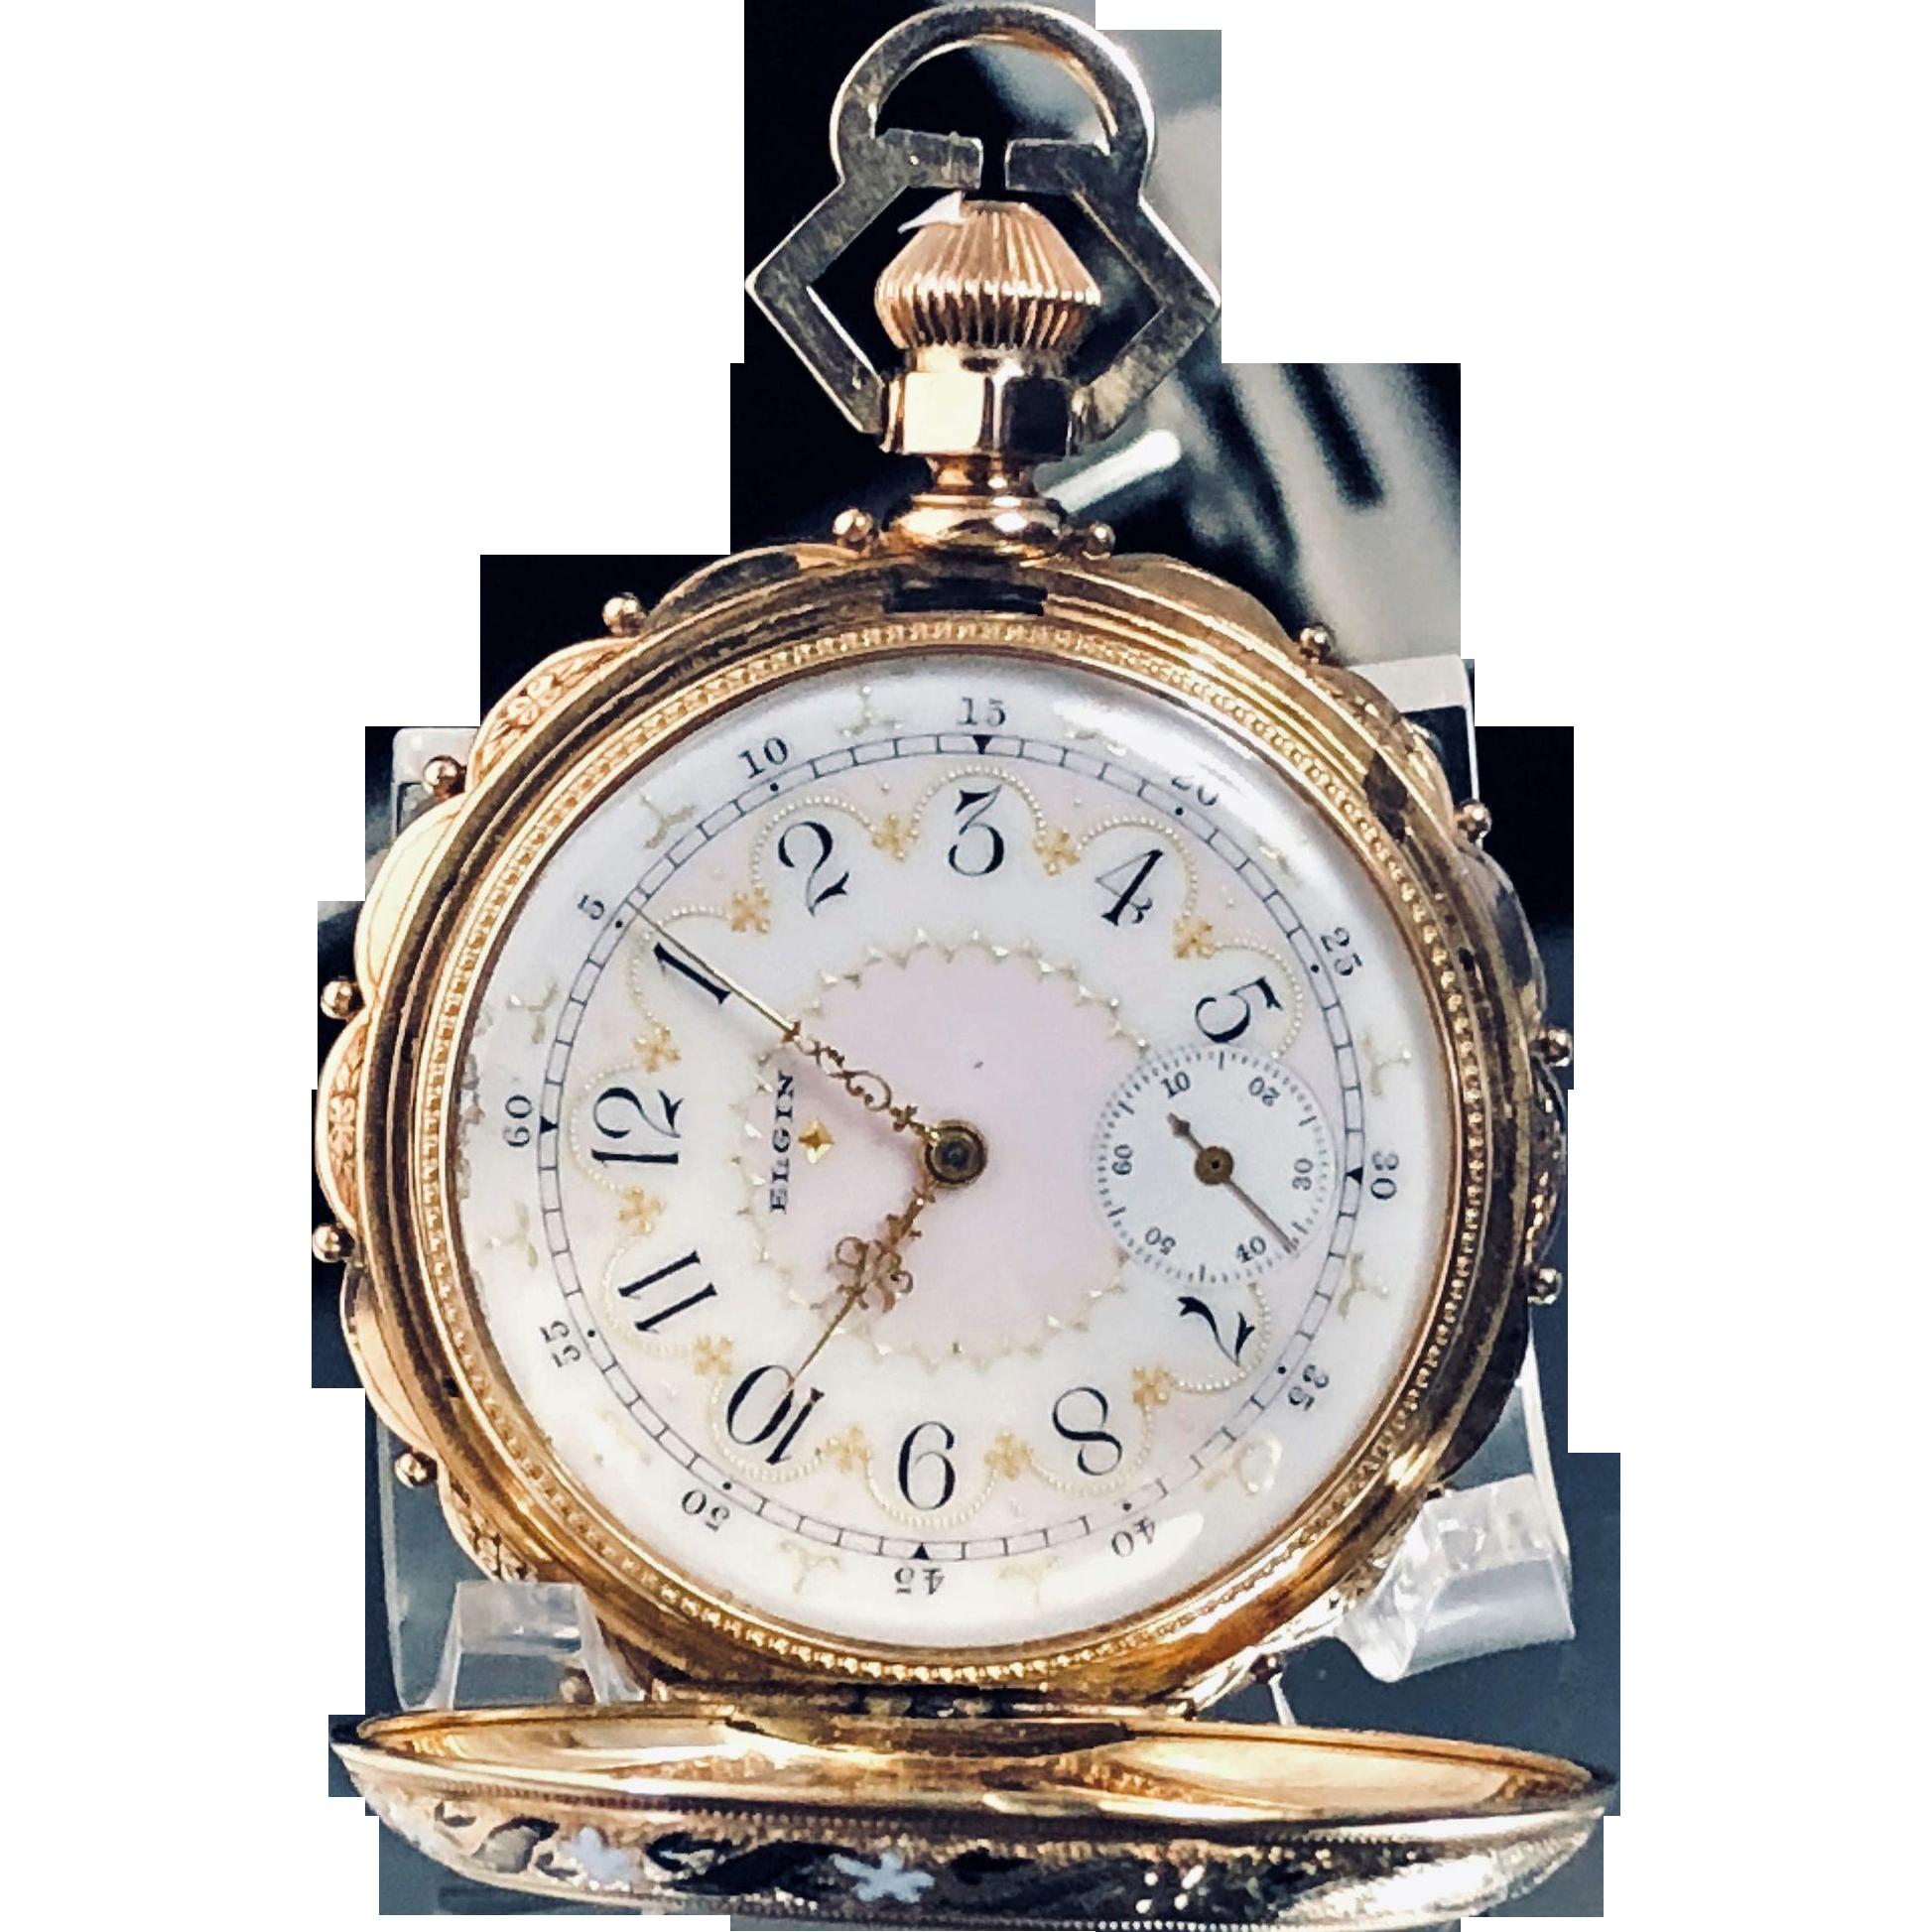 Elgin National Watch Co 14k Gold Fancy Dial Pocket Watch Circa 1883 Vintage Watches Pocket Watch Pocket Watch Antique